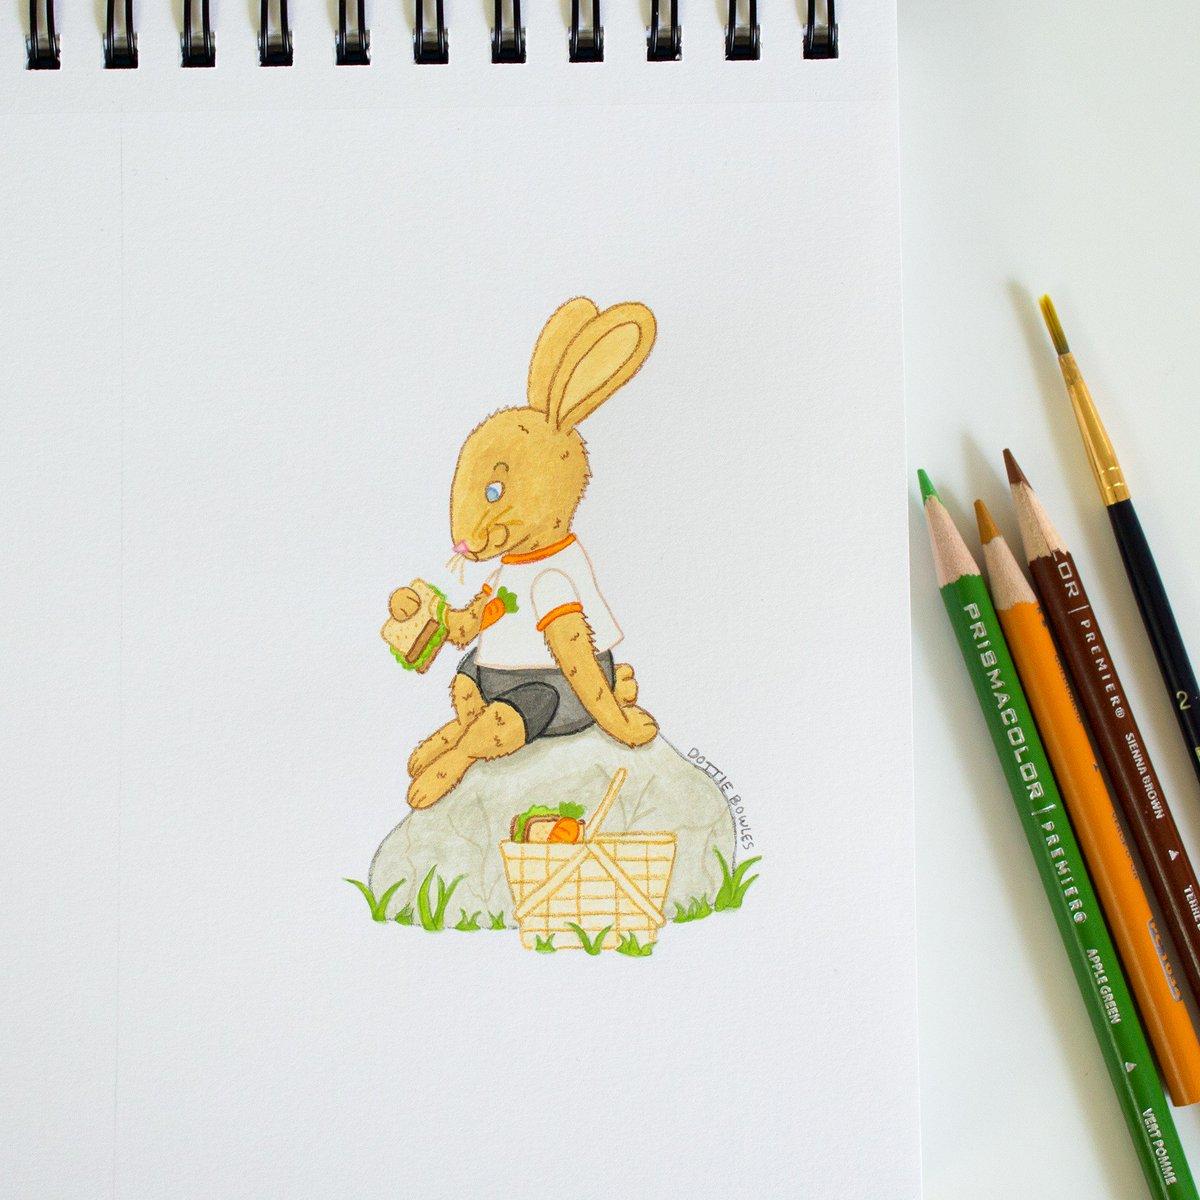 """7 Days of Yum"" Instagram art challenge Day 3: ""Veggie Goodness"" This bunny packed himself a picnic full of veggie sandwiches! #gouache #artph<br>http://pic.twitter.com/55Lj09w4xn"